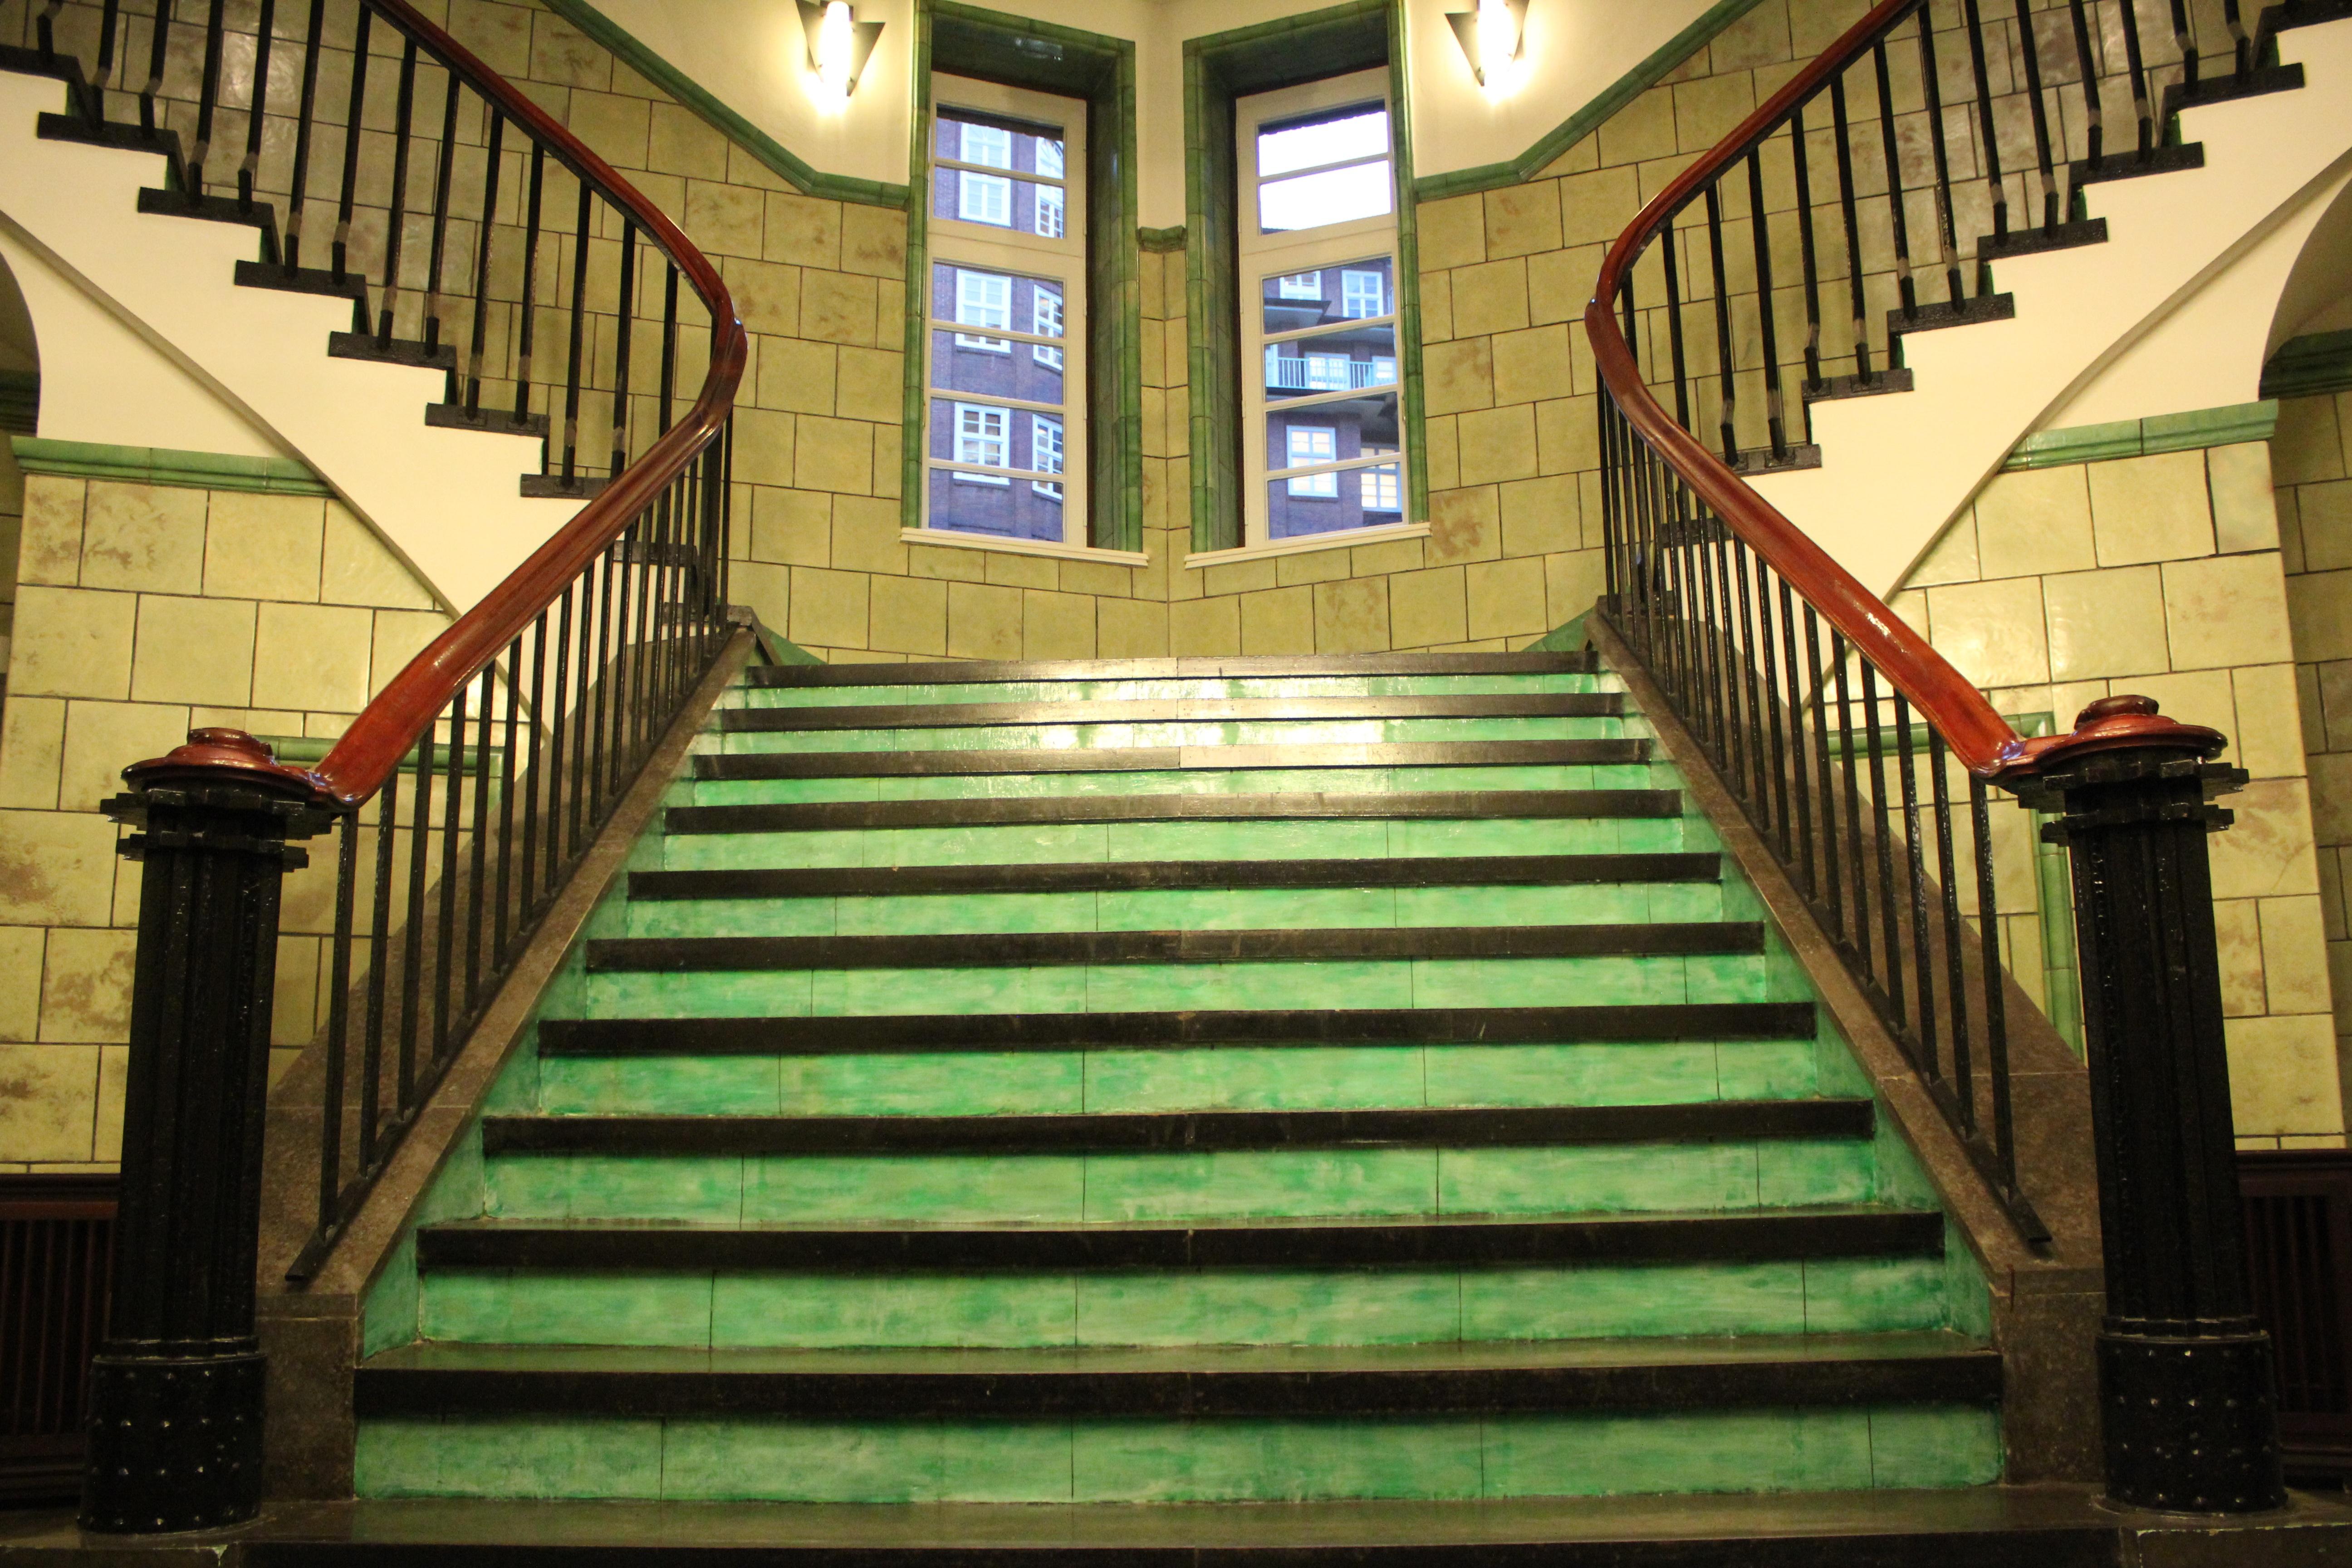 Architecture Wood Staircase Railing High Spiral Staircase Interior Design  Stairs Symmetry Estate Rise Hamburg Screenshot Gradually